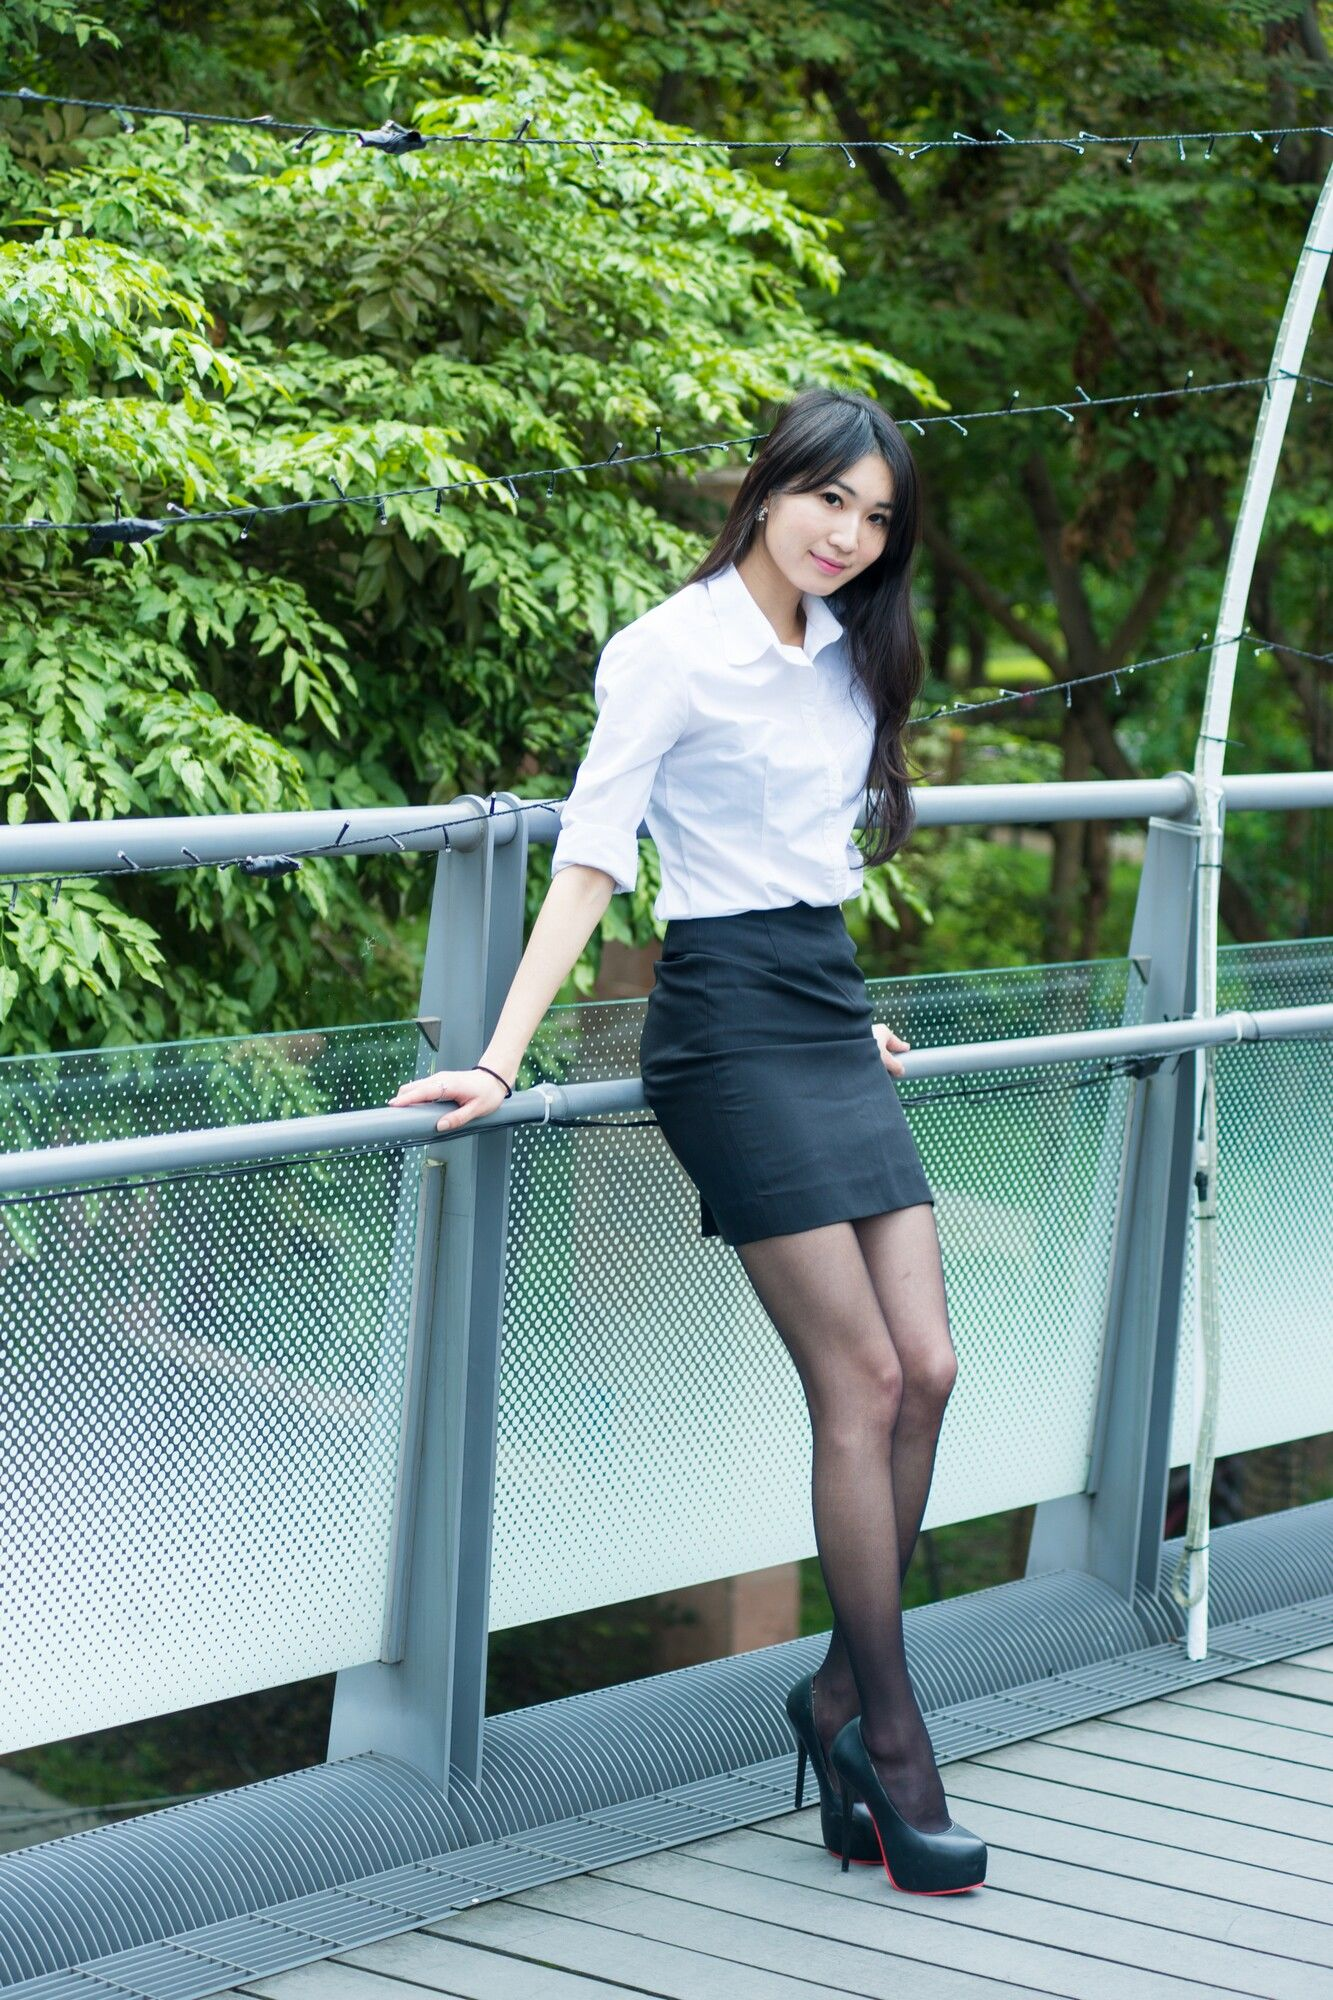 VOL.1269 [台湾正妹]丝袜美腿长腿美女街拍美臀黑丝制服:小梵超高清个人性感漂亮大图(37P)